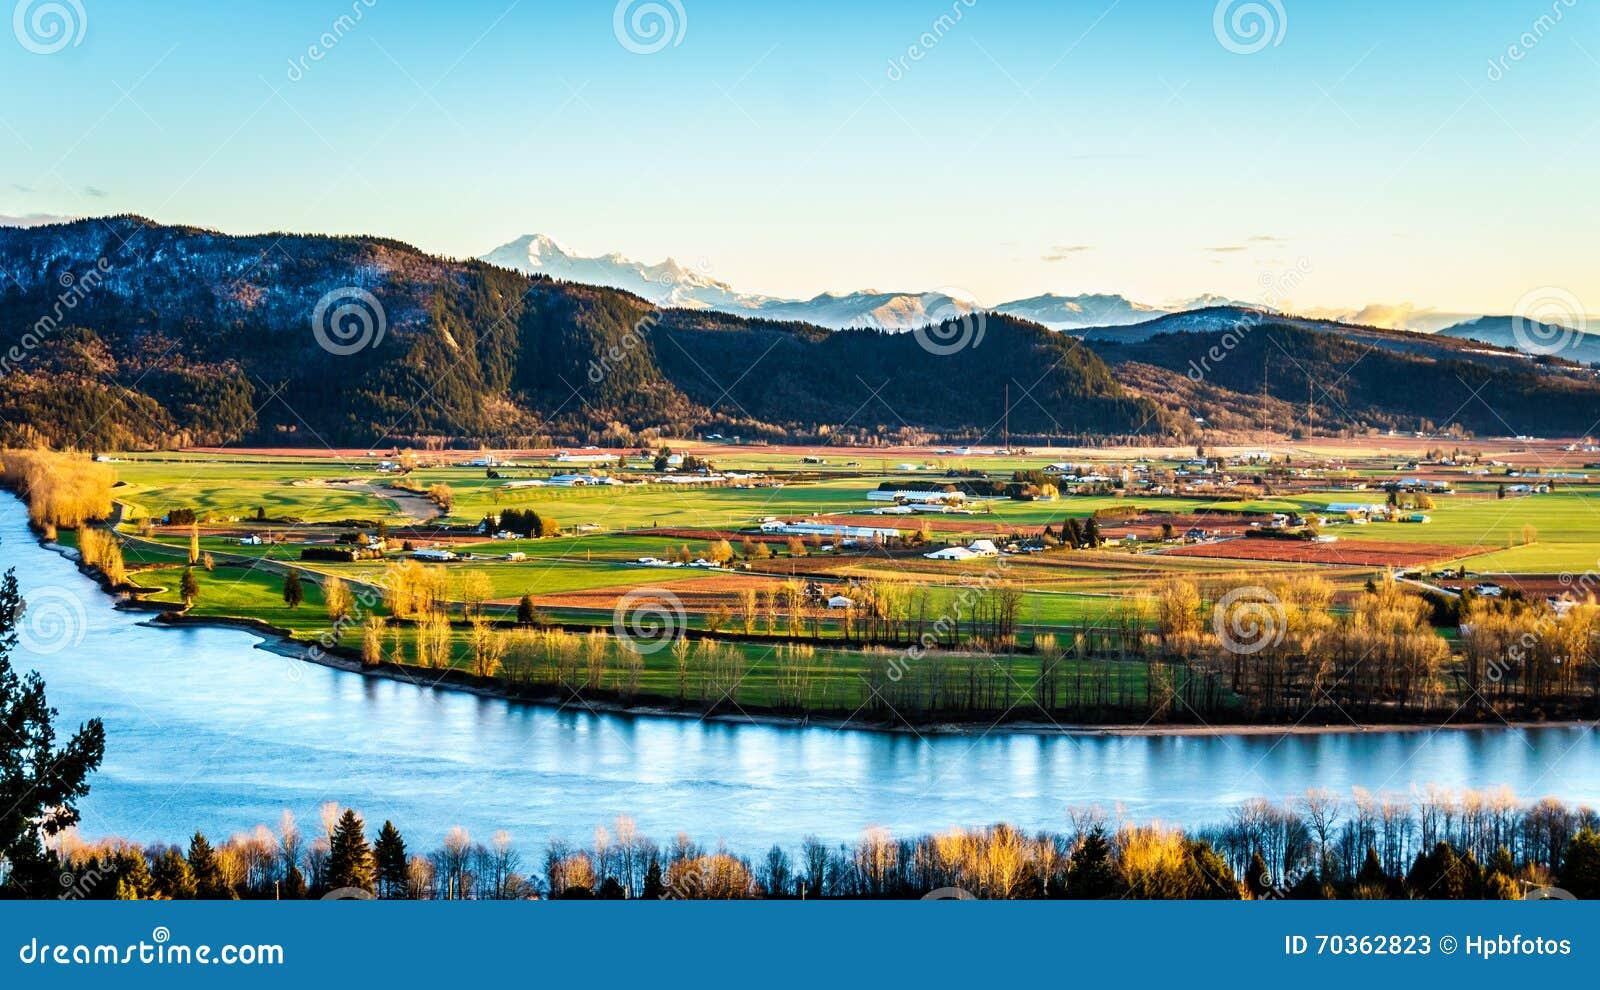 Den fertila jordbruksmarken av Fraser Valley i British Columbia